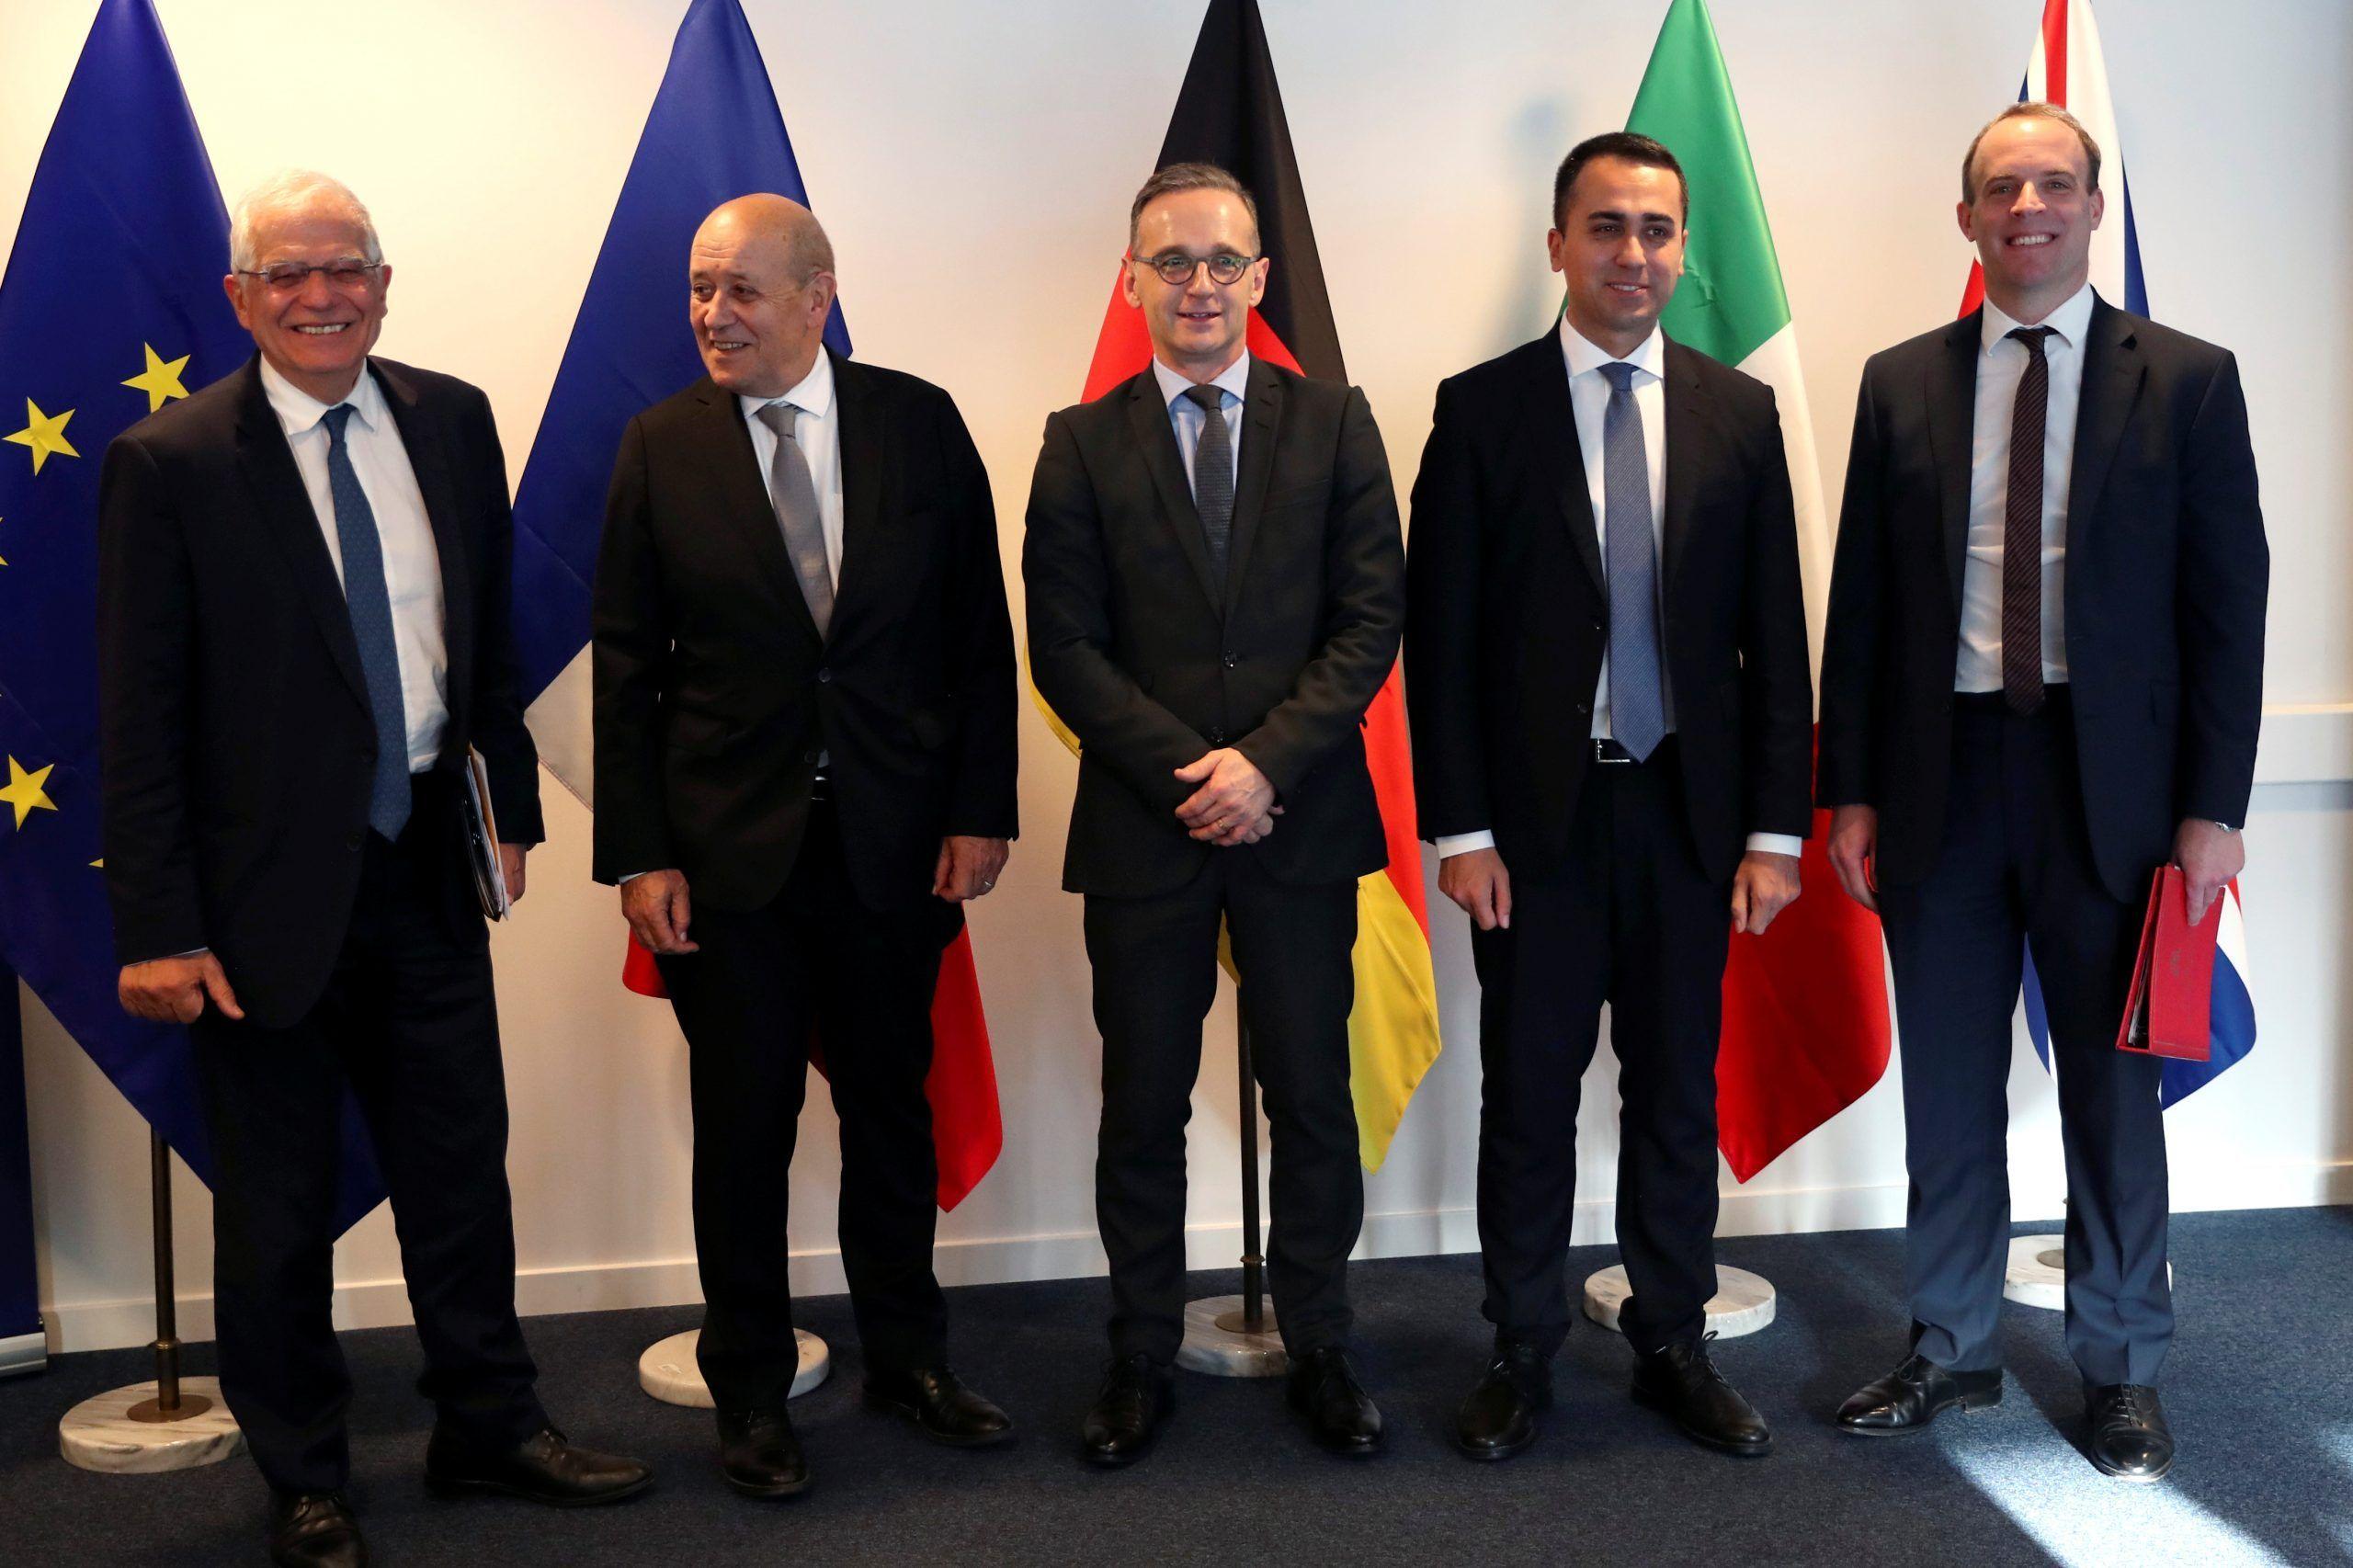 2020-01-07T141408Z_1994957437_RC22BE9RH885_RTRMADP_3_LIBYA-SECURITY-EU-scaled